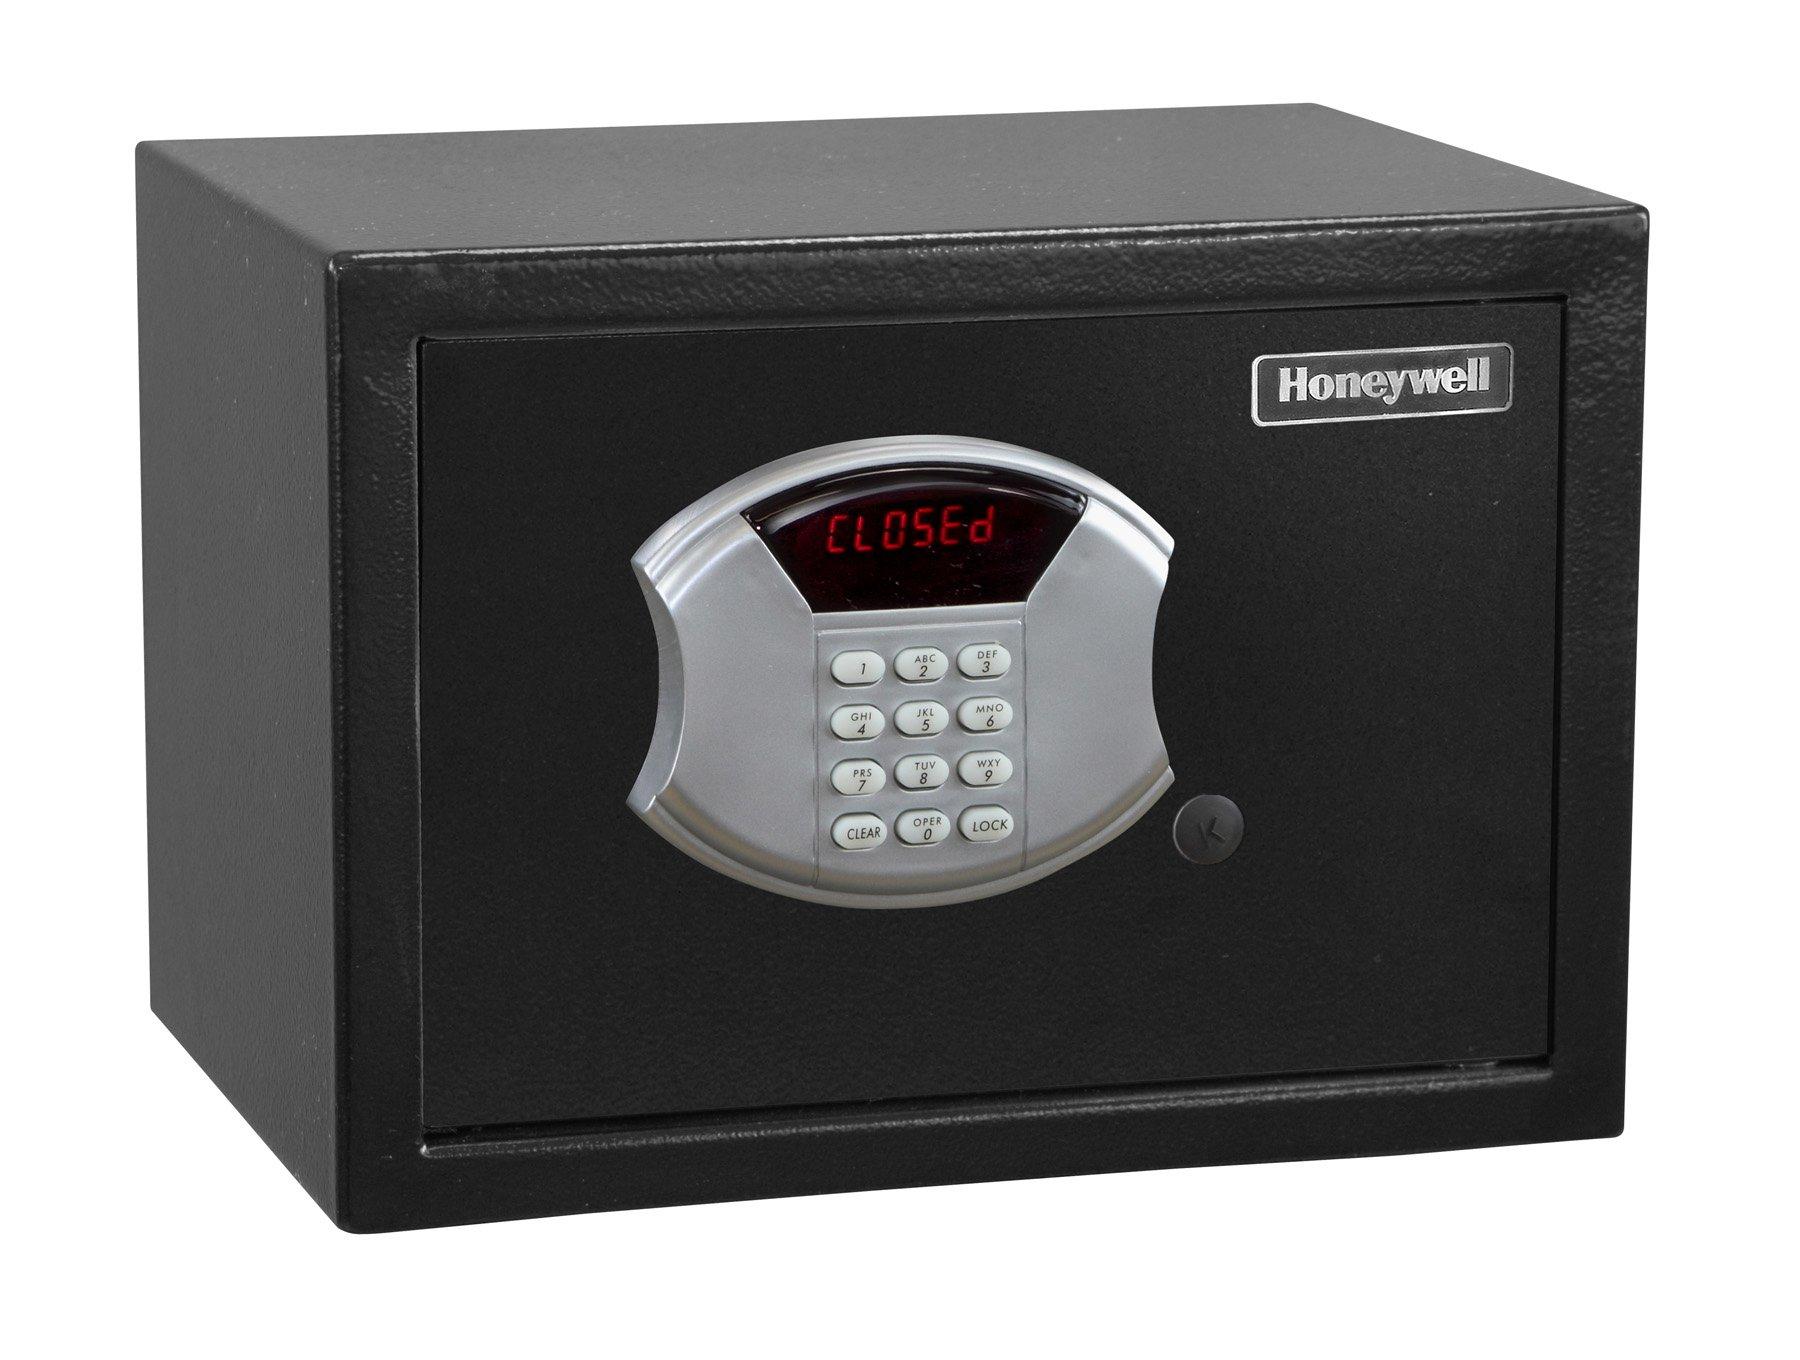 HONEYWELL - 5113 Steel Security Safe with Hotel-Style Digital Lock, 0.50-Cubic Feet, Black